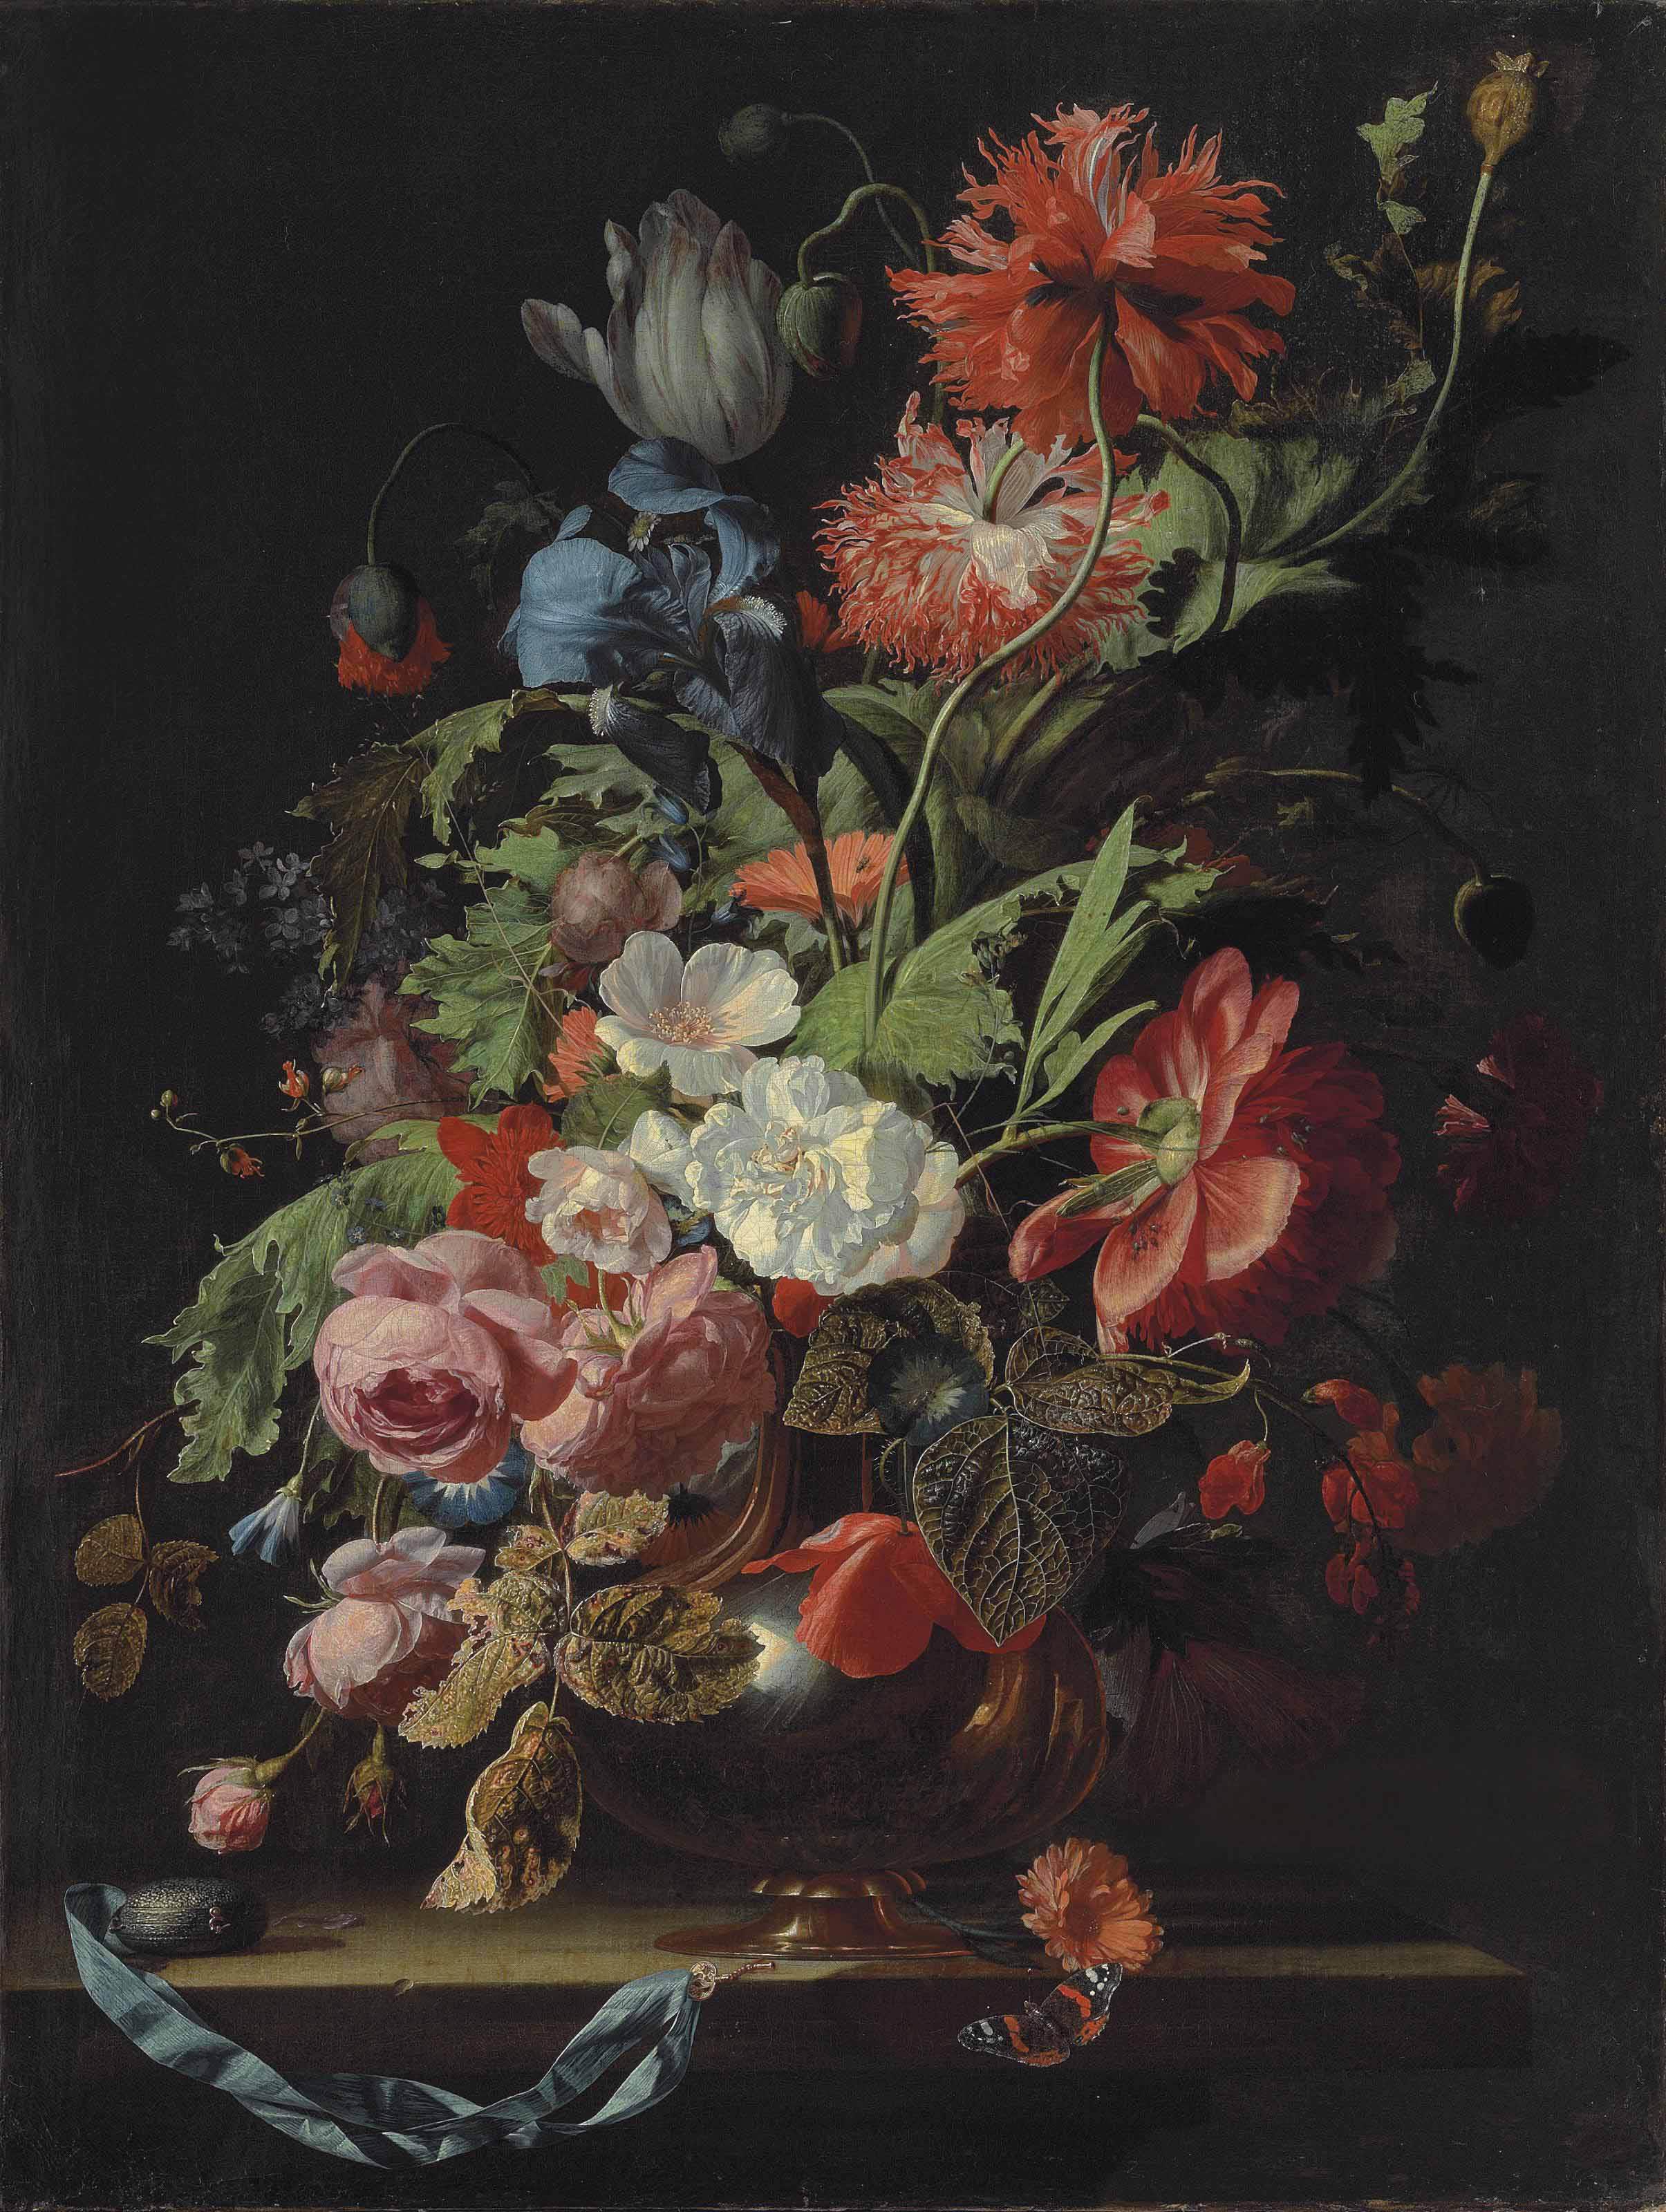 Simon Verelst (The Hague 1644-?1721 London)